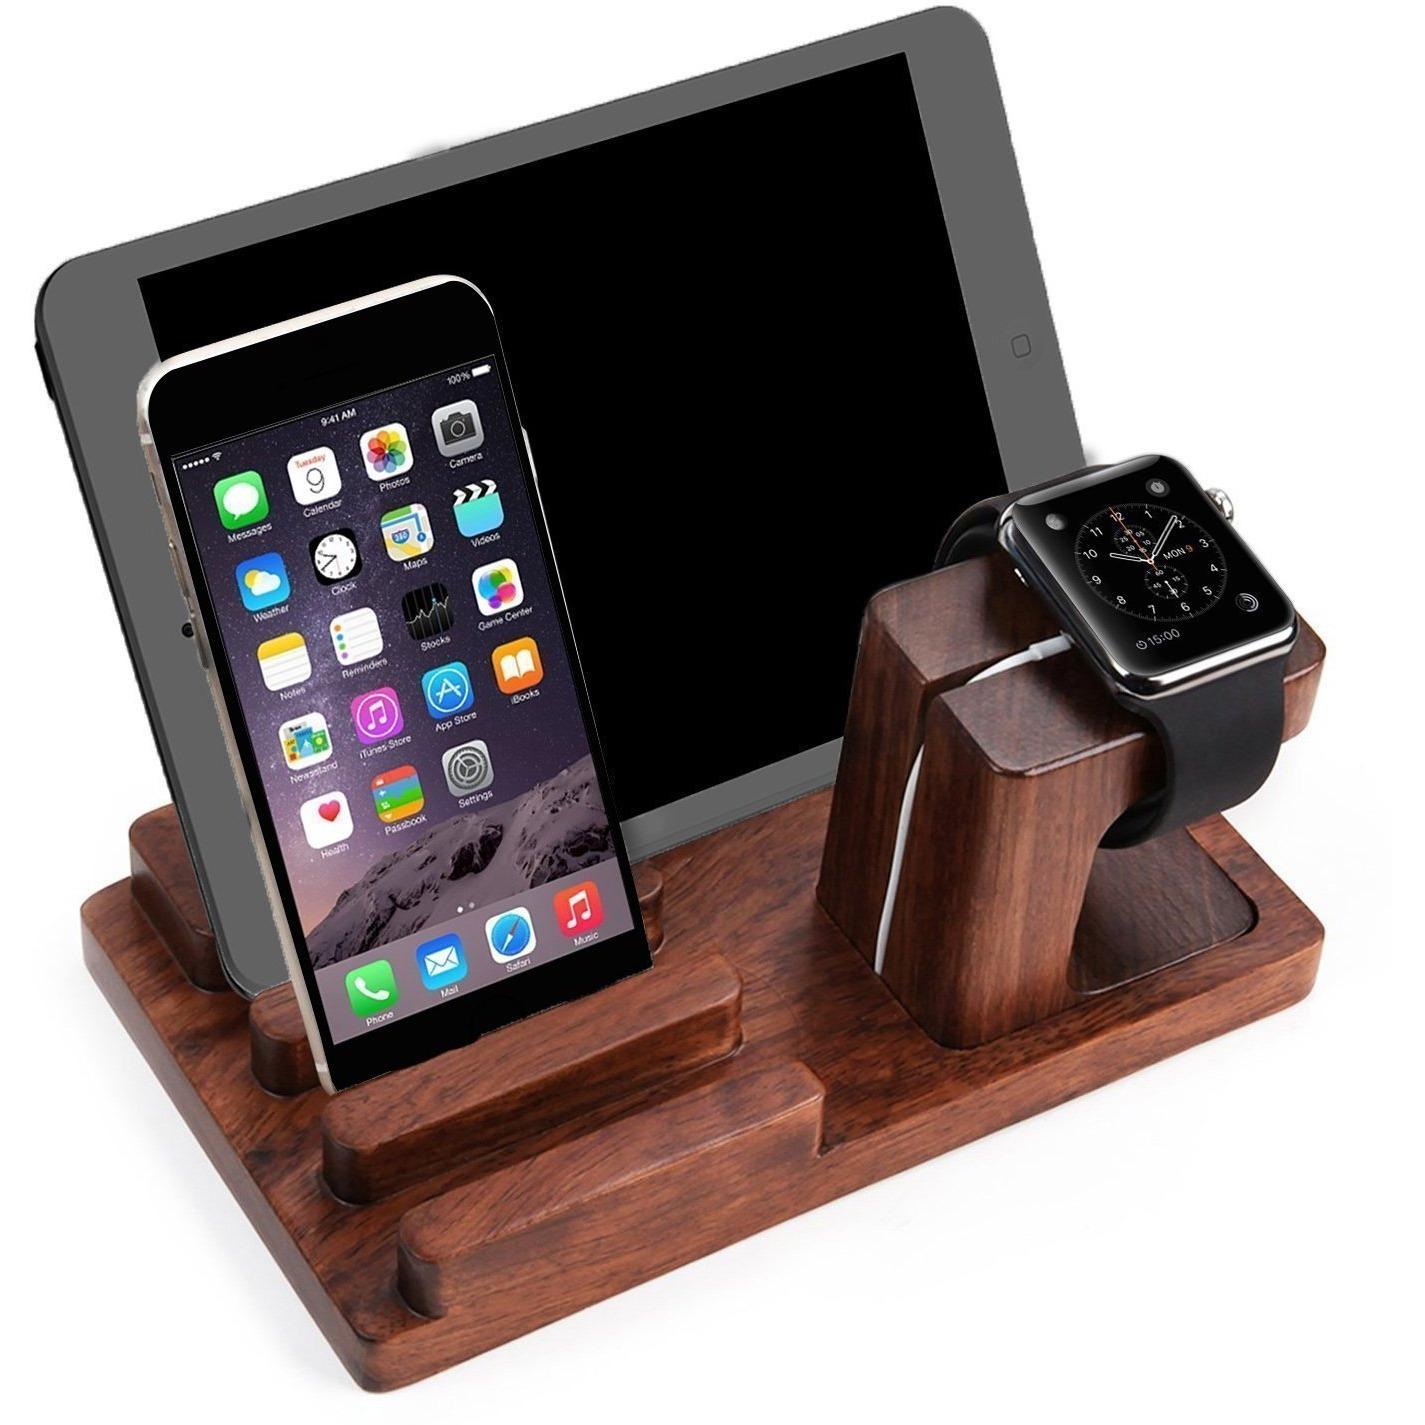 518850bf5 Buy Online Winmaarc Wooden Phone Charging Station Dock